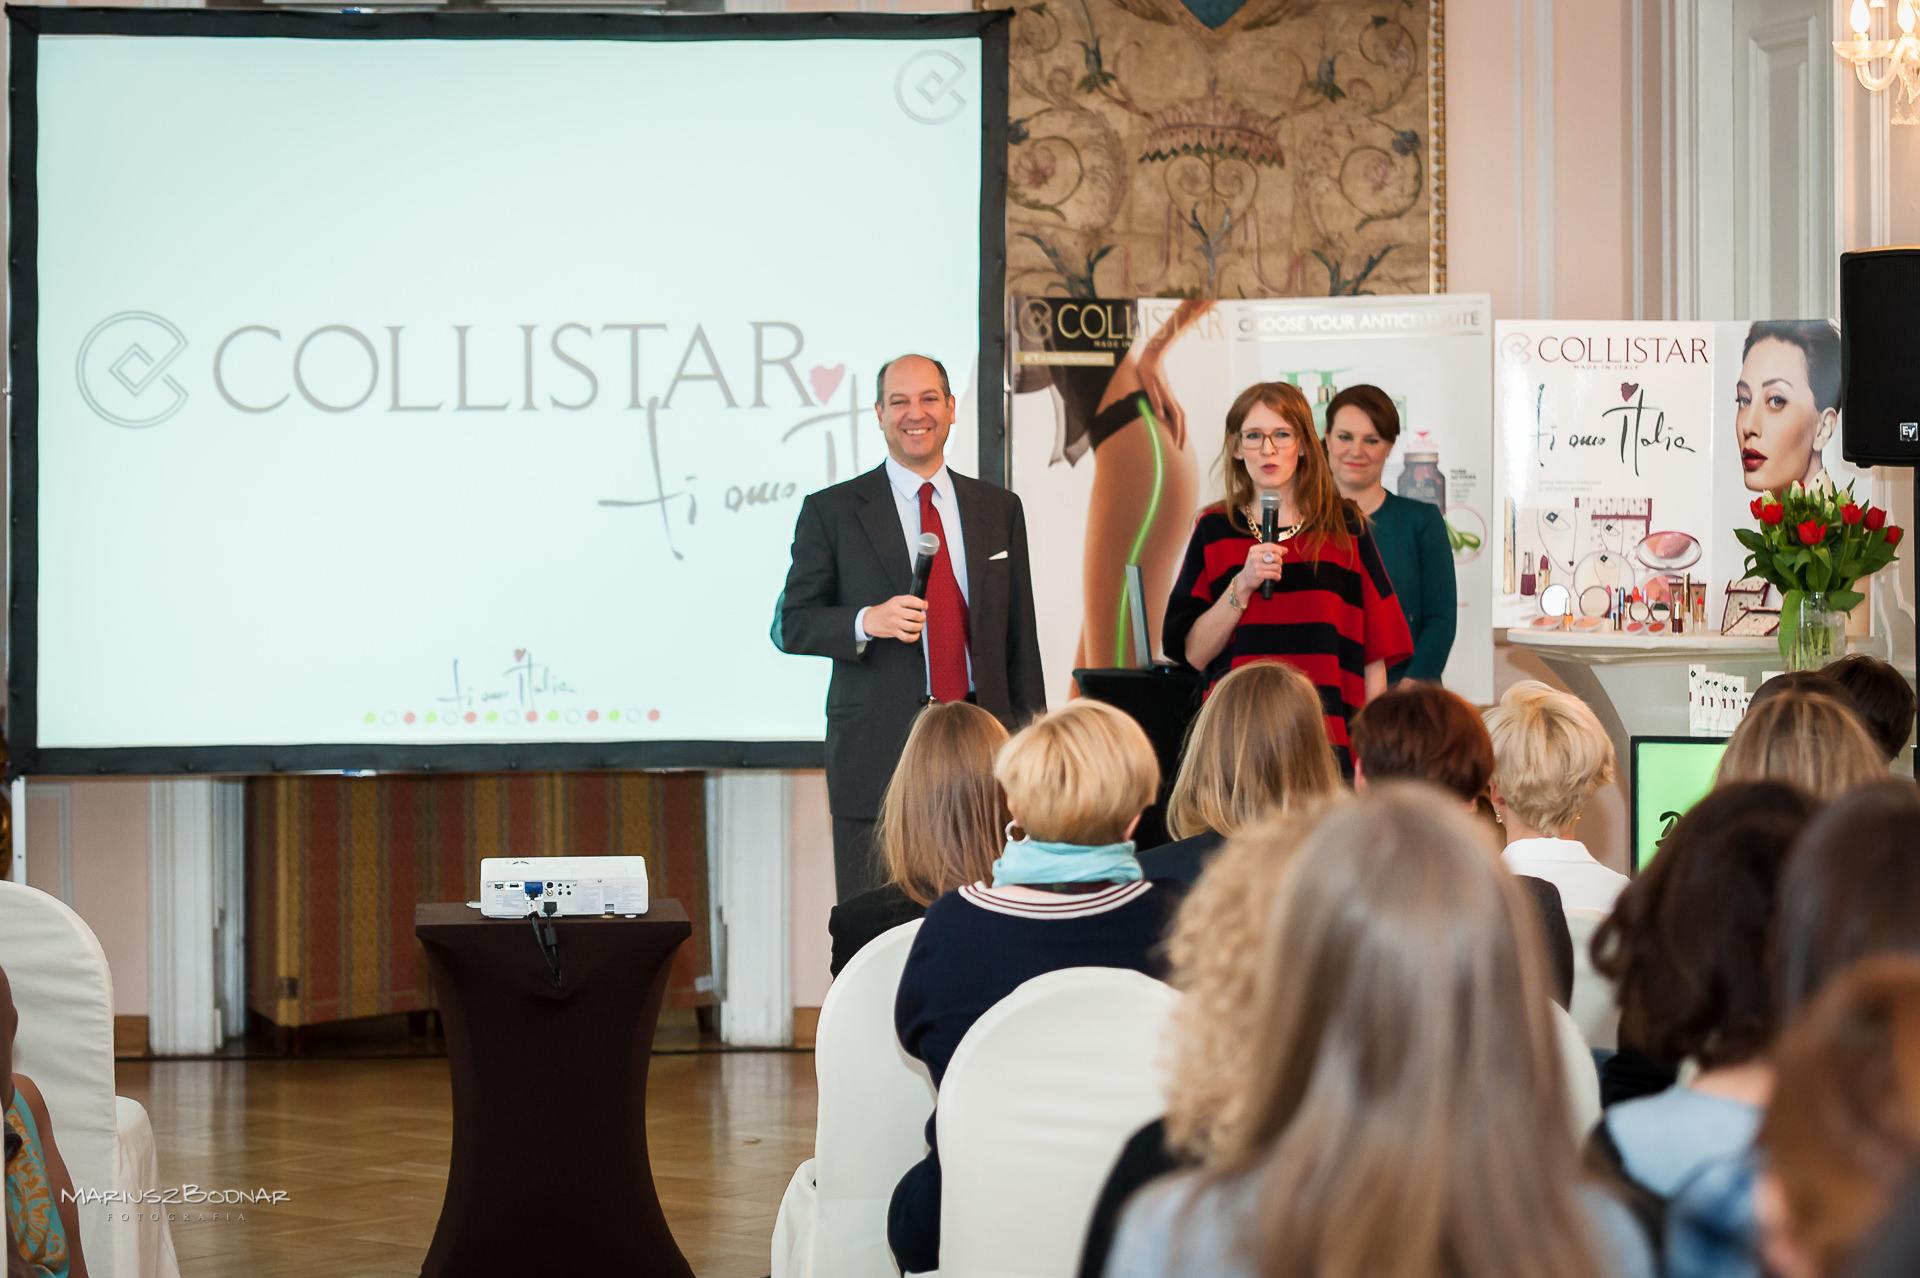 Collistar-konferencja